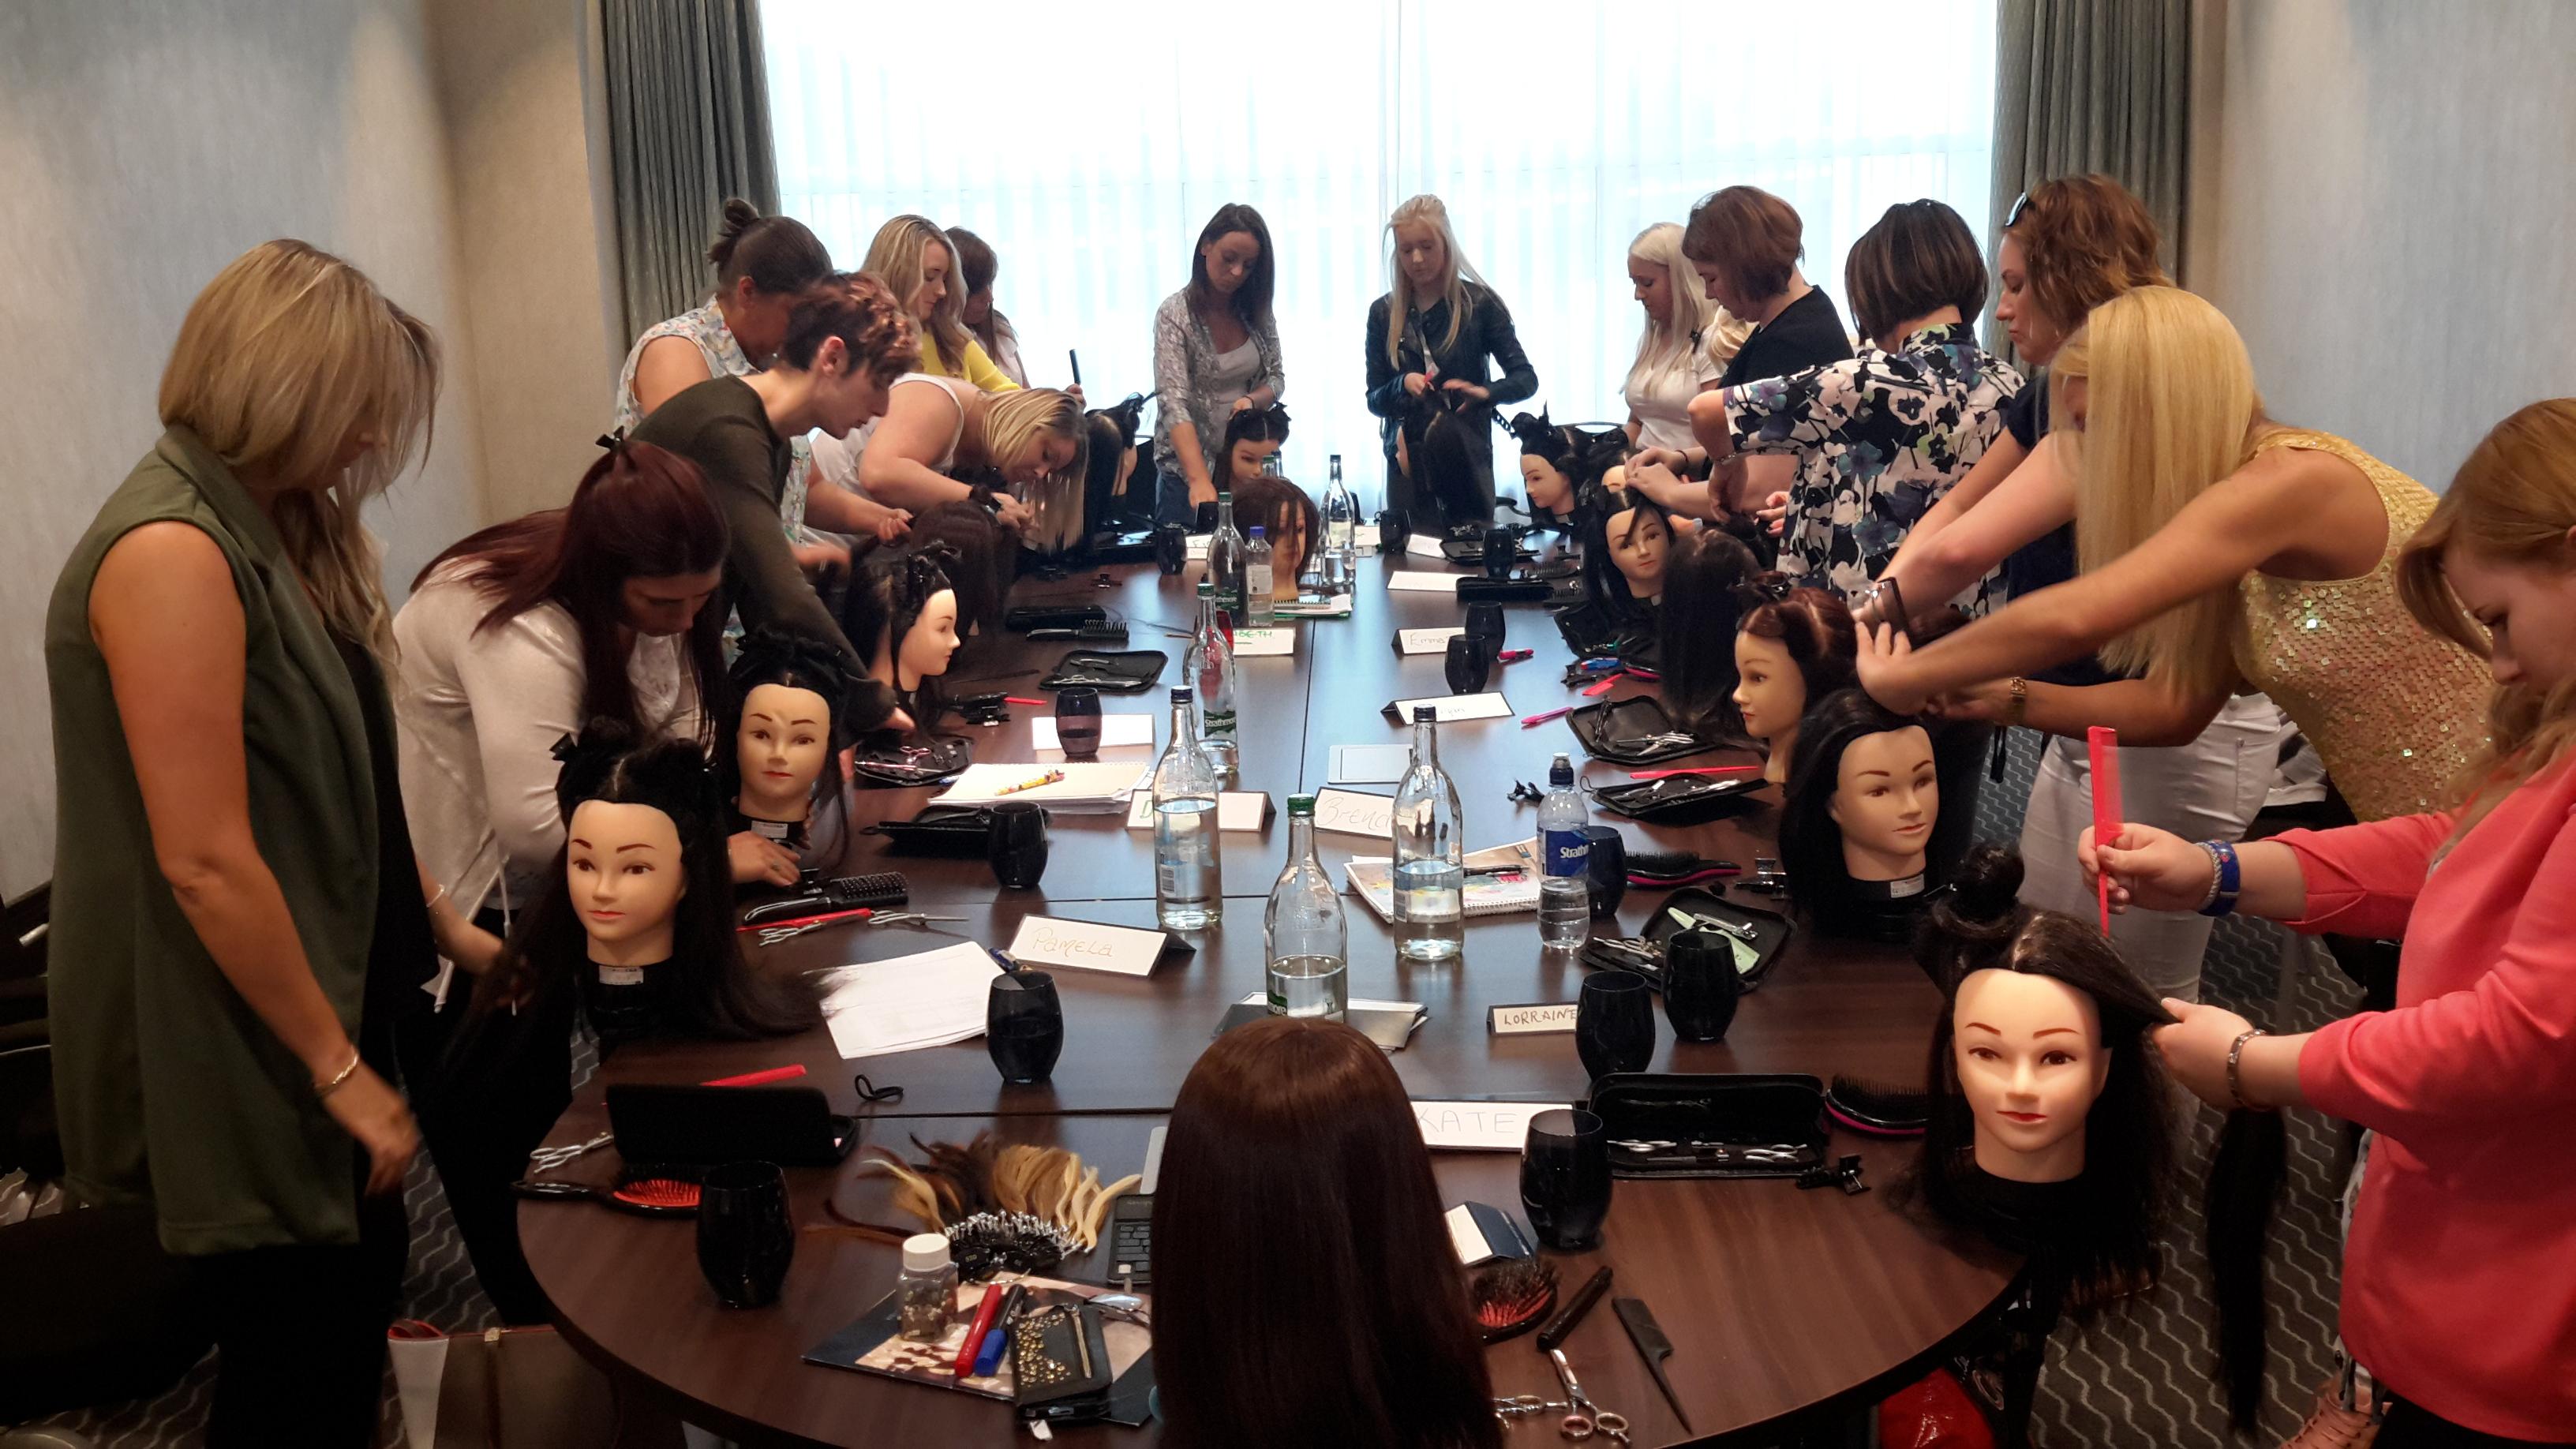 Glasgow Hair Extension training academy diane shawe 2015-09-07 17.51 (28)